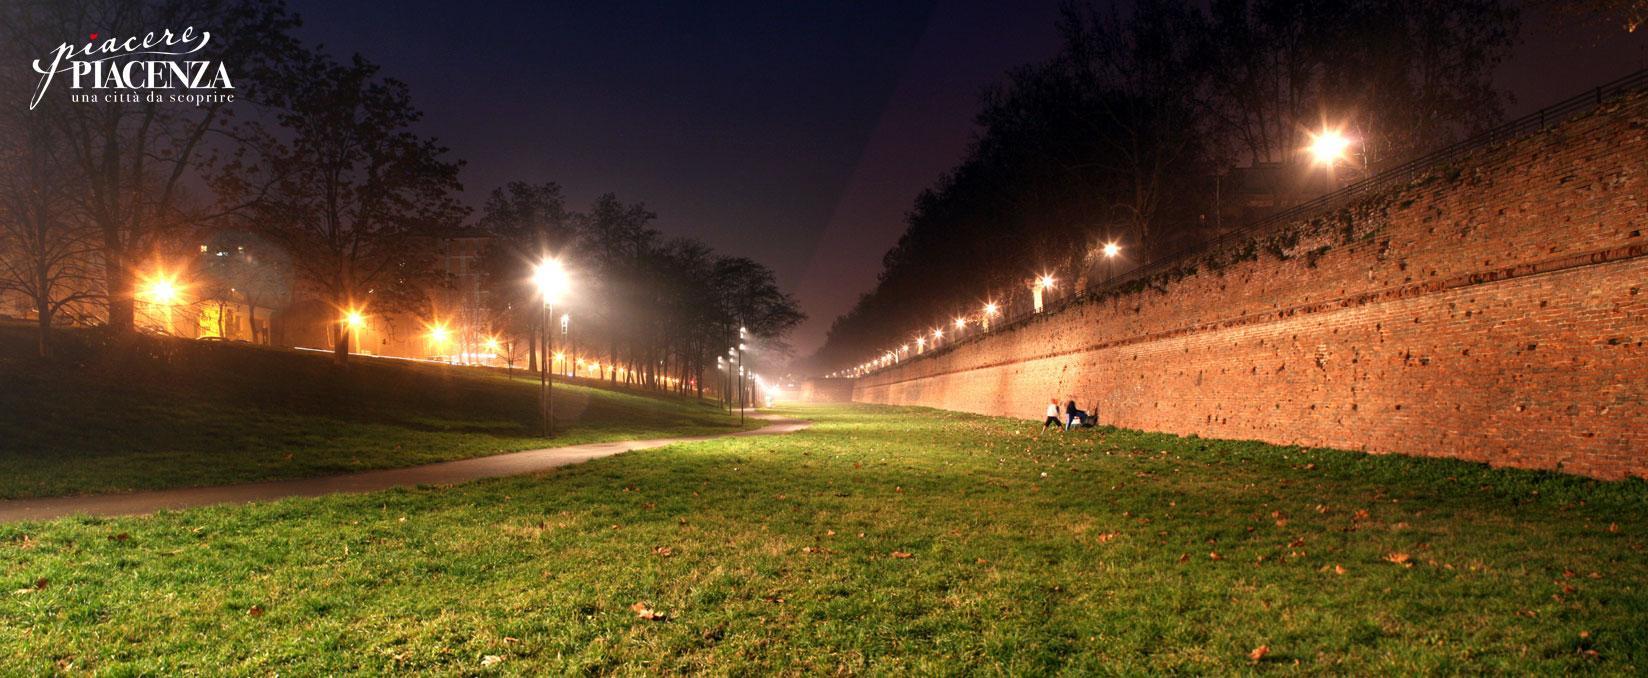 Mura Farnesiane, Piacenza | Ph. Comune di Piacenza